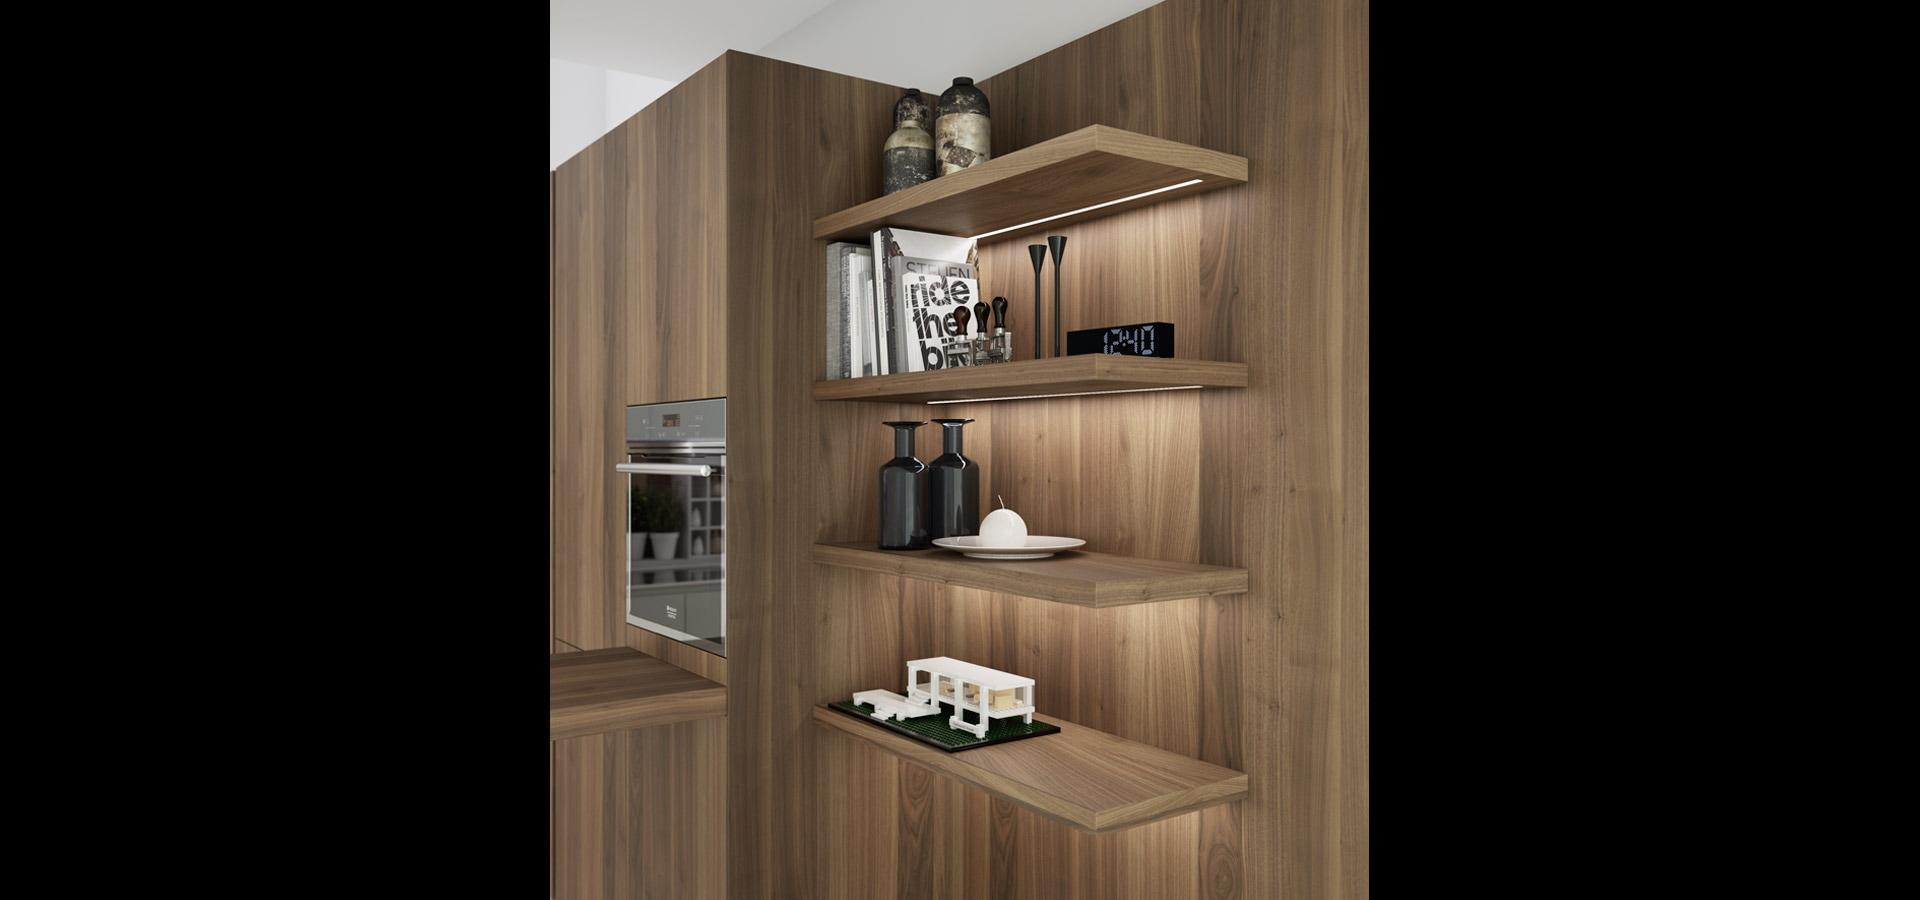 Cucina elegante e moderna in legno | Limha Wood | MITON Cucine